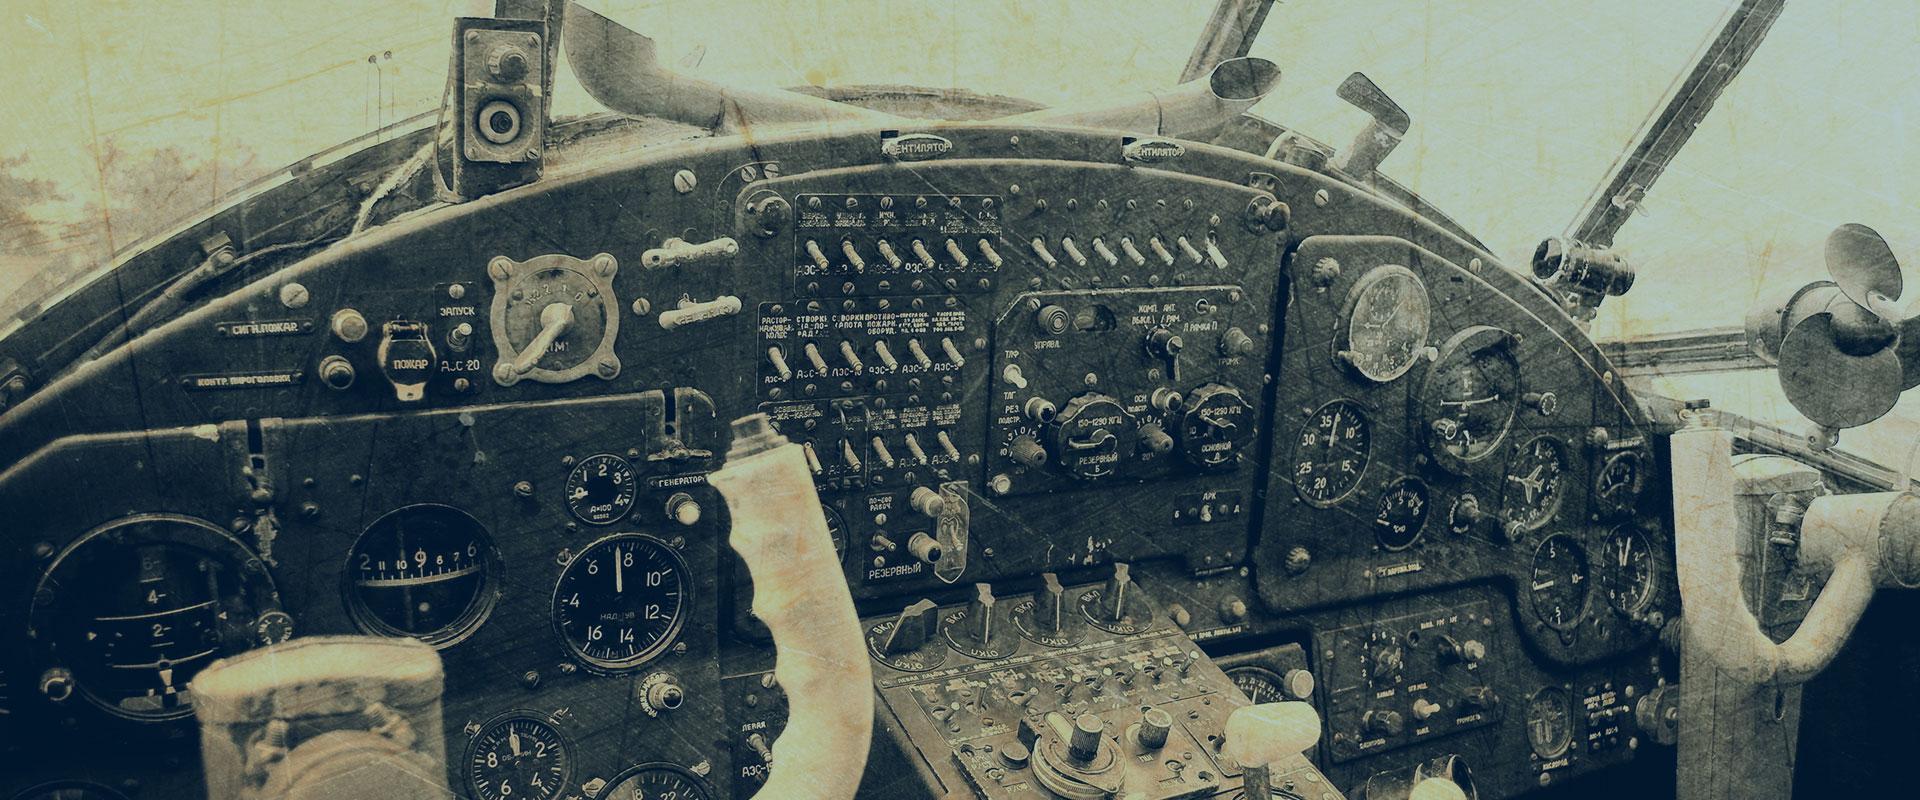 Capa banner-02.jpg - Seguro Obrigatório de Aeronaves - RETA